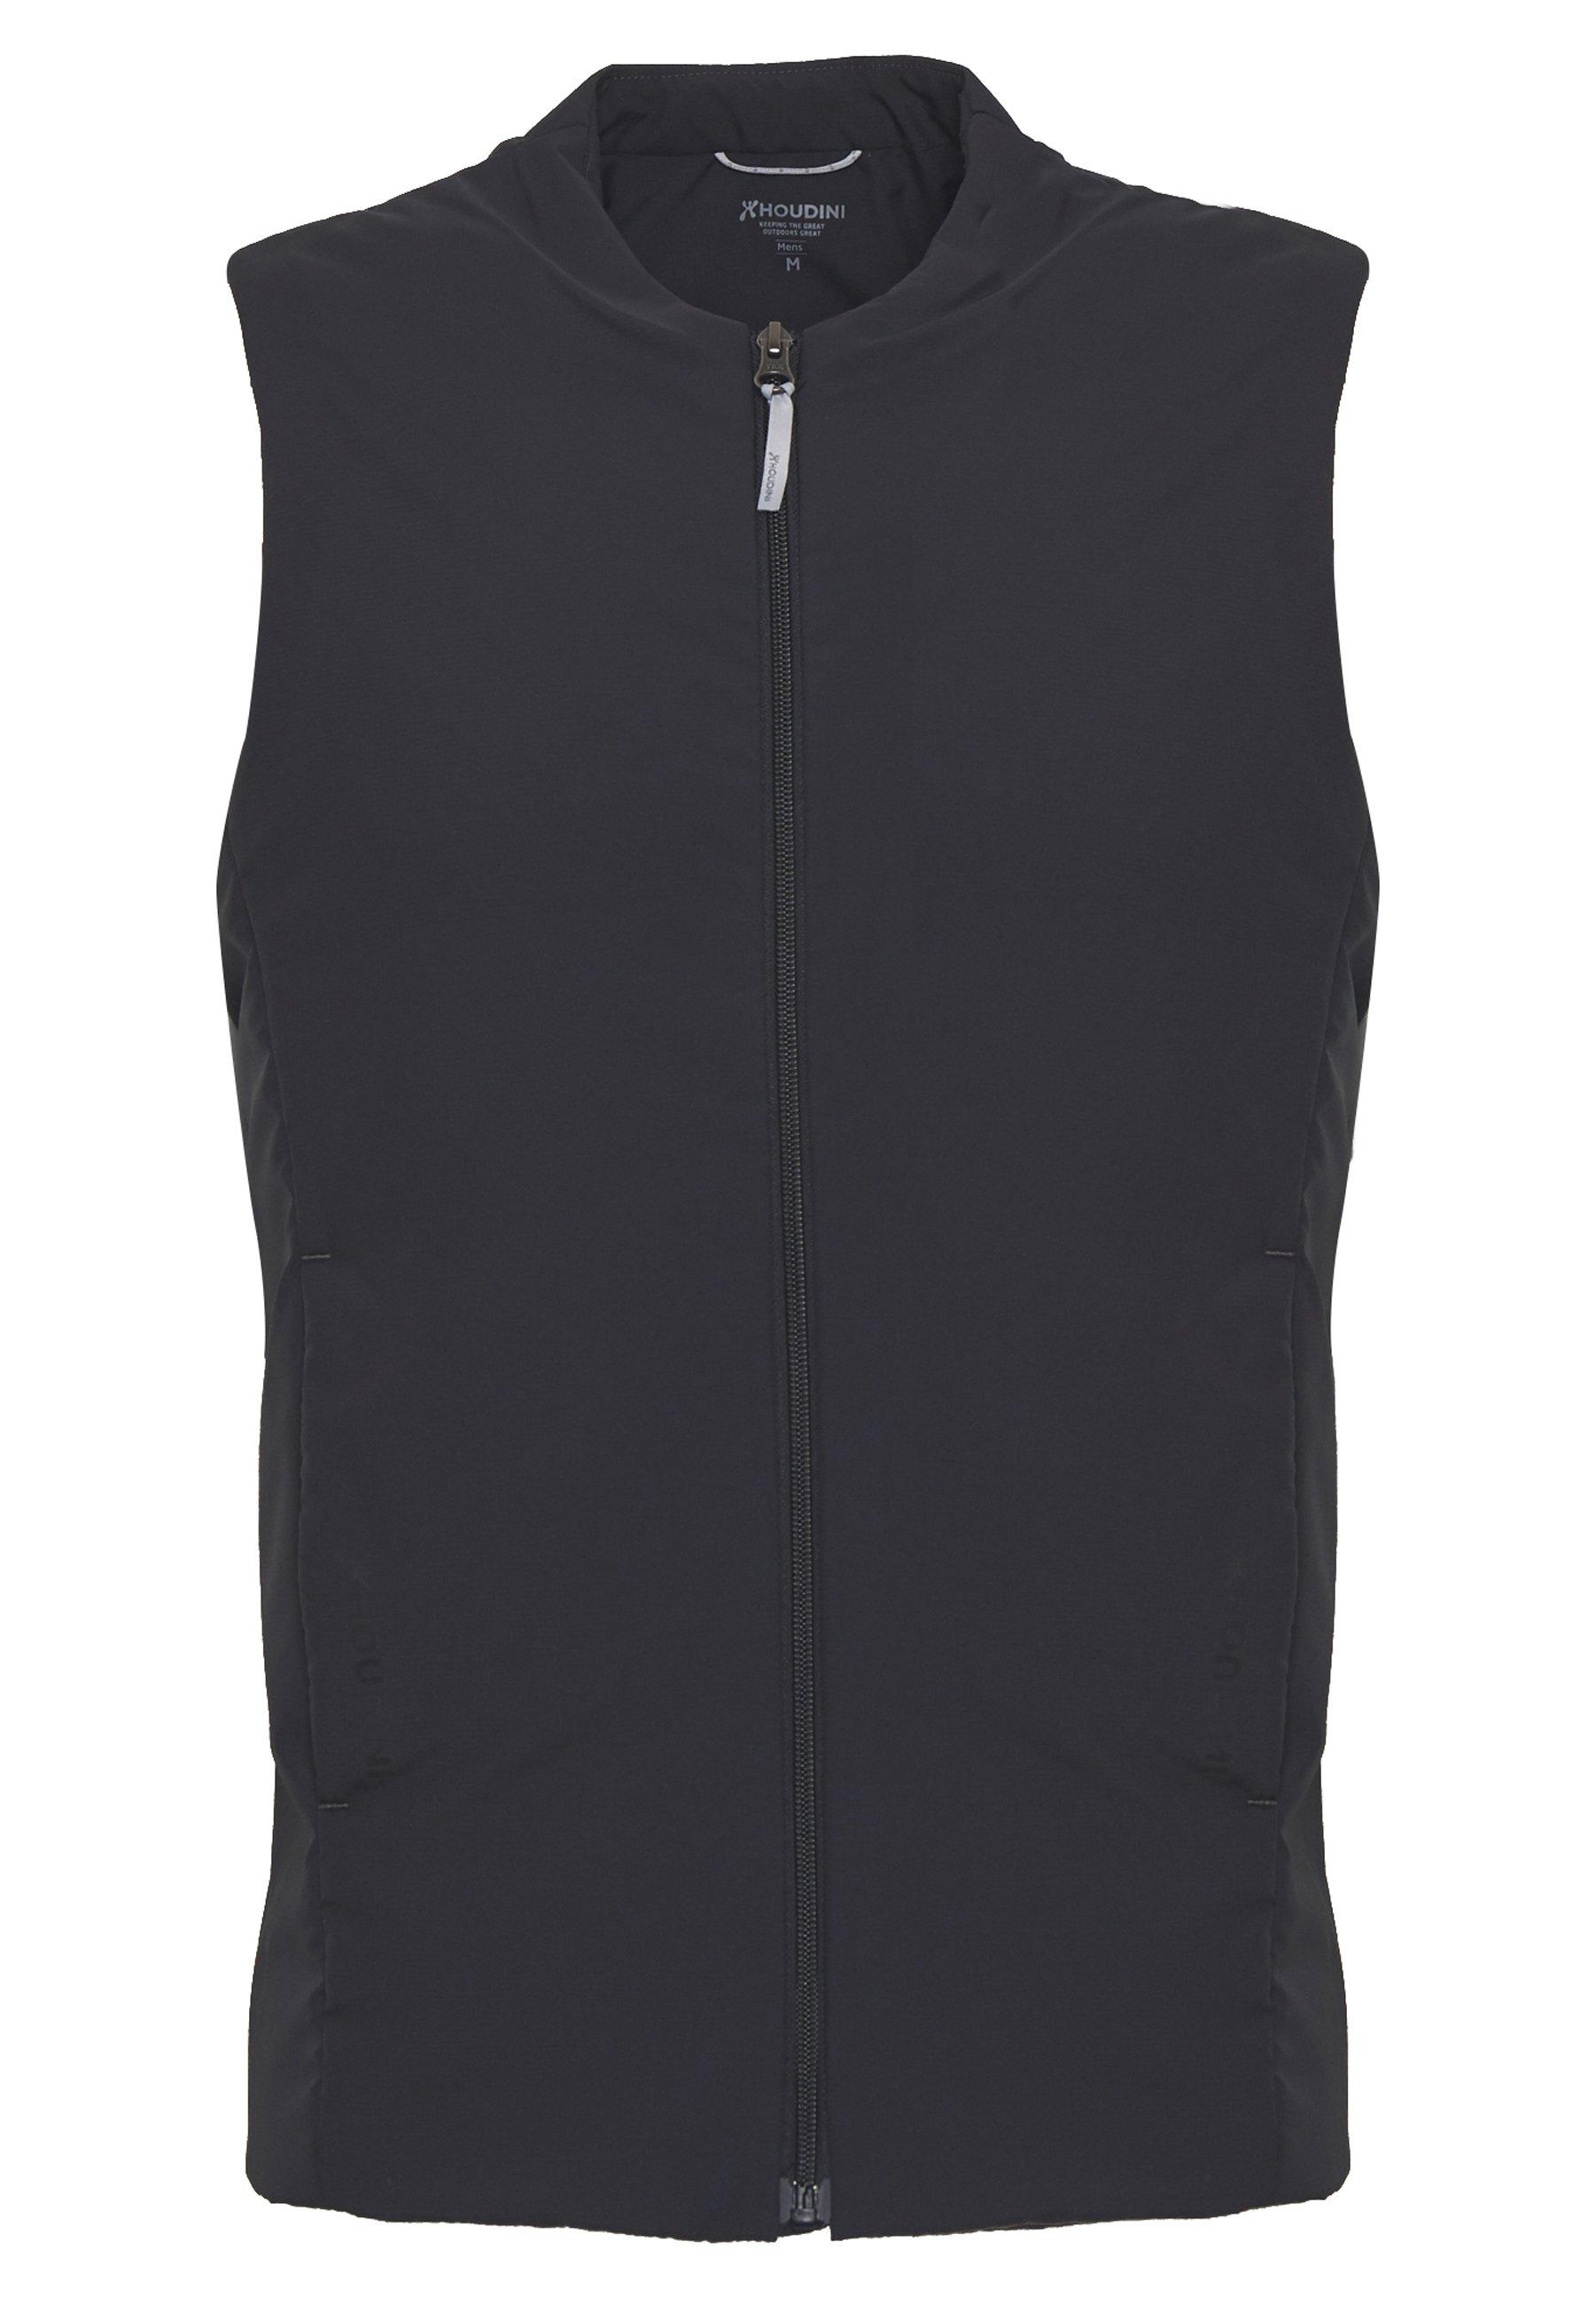 Houdini Venture Vest - Waistcoat True Black UK